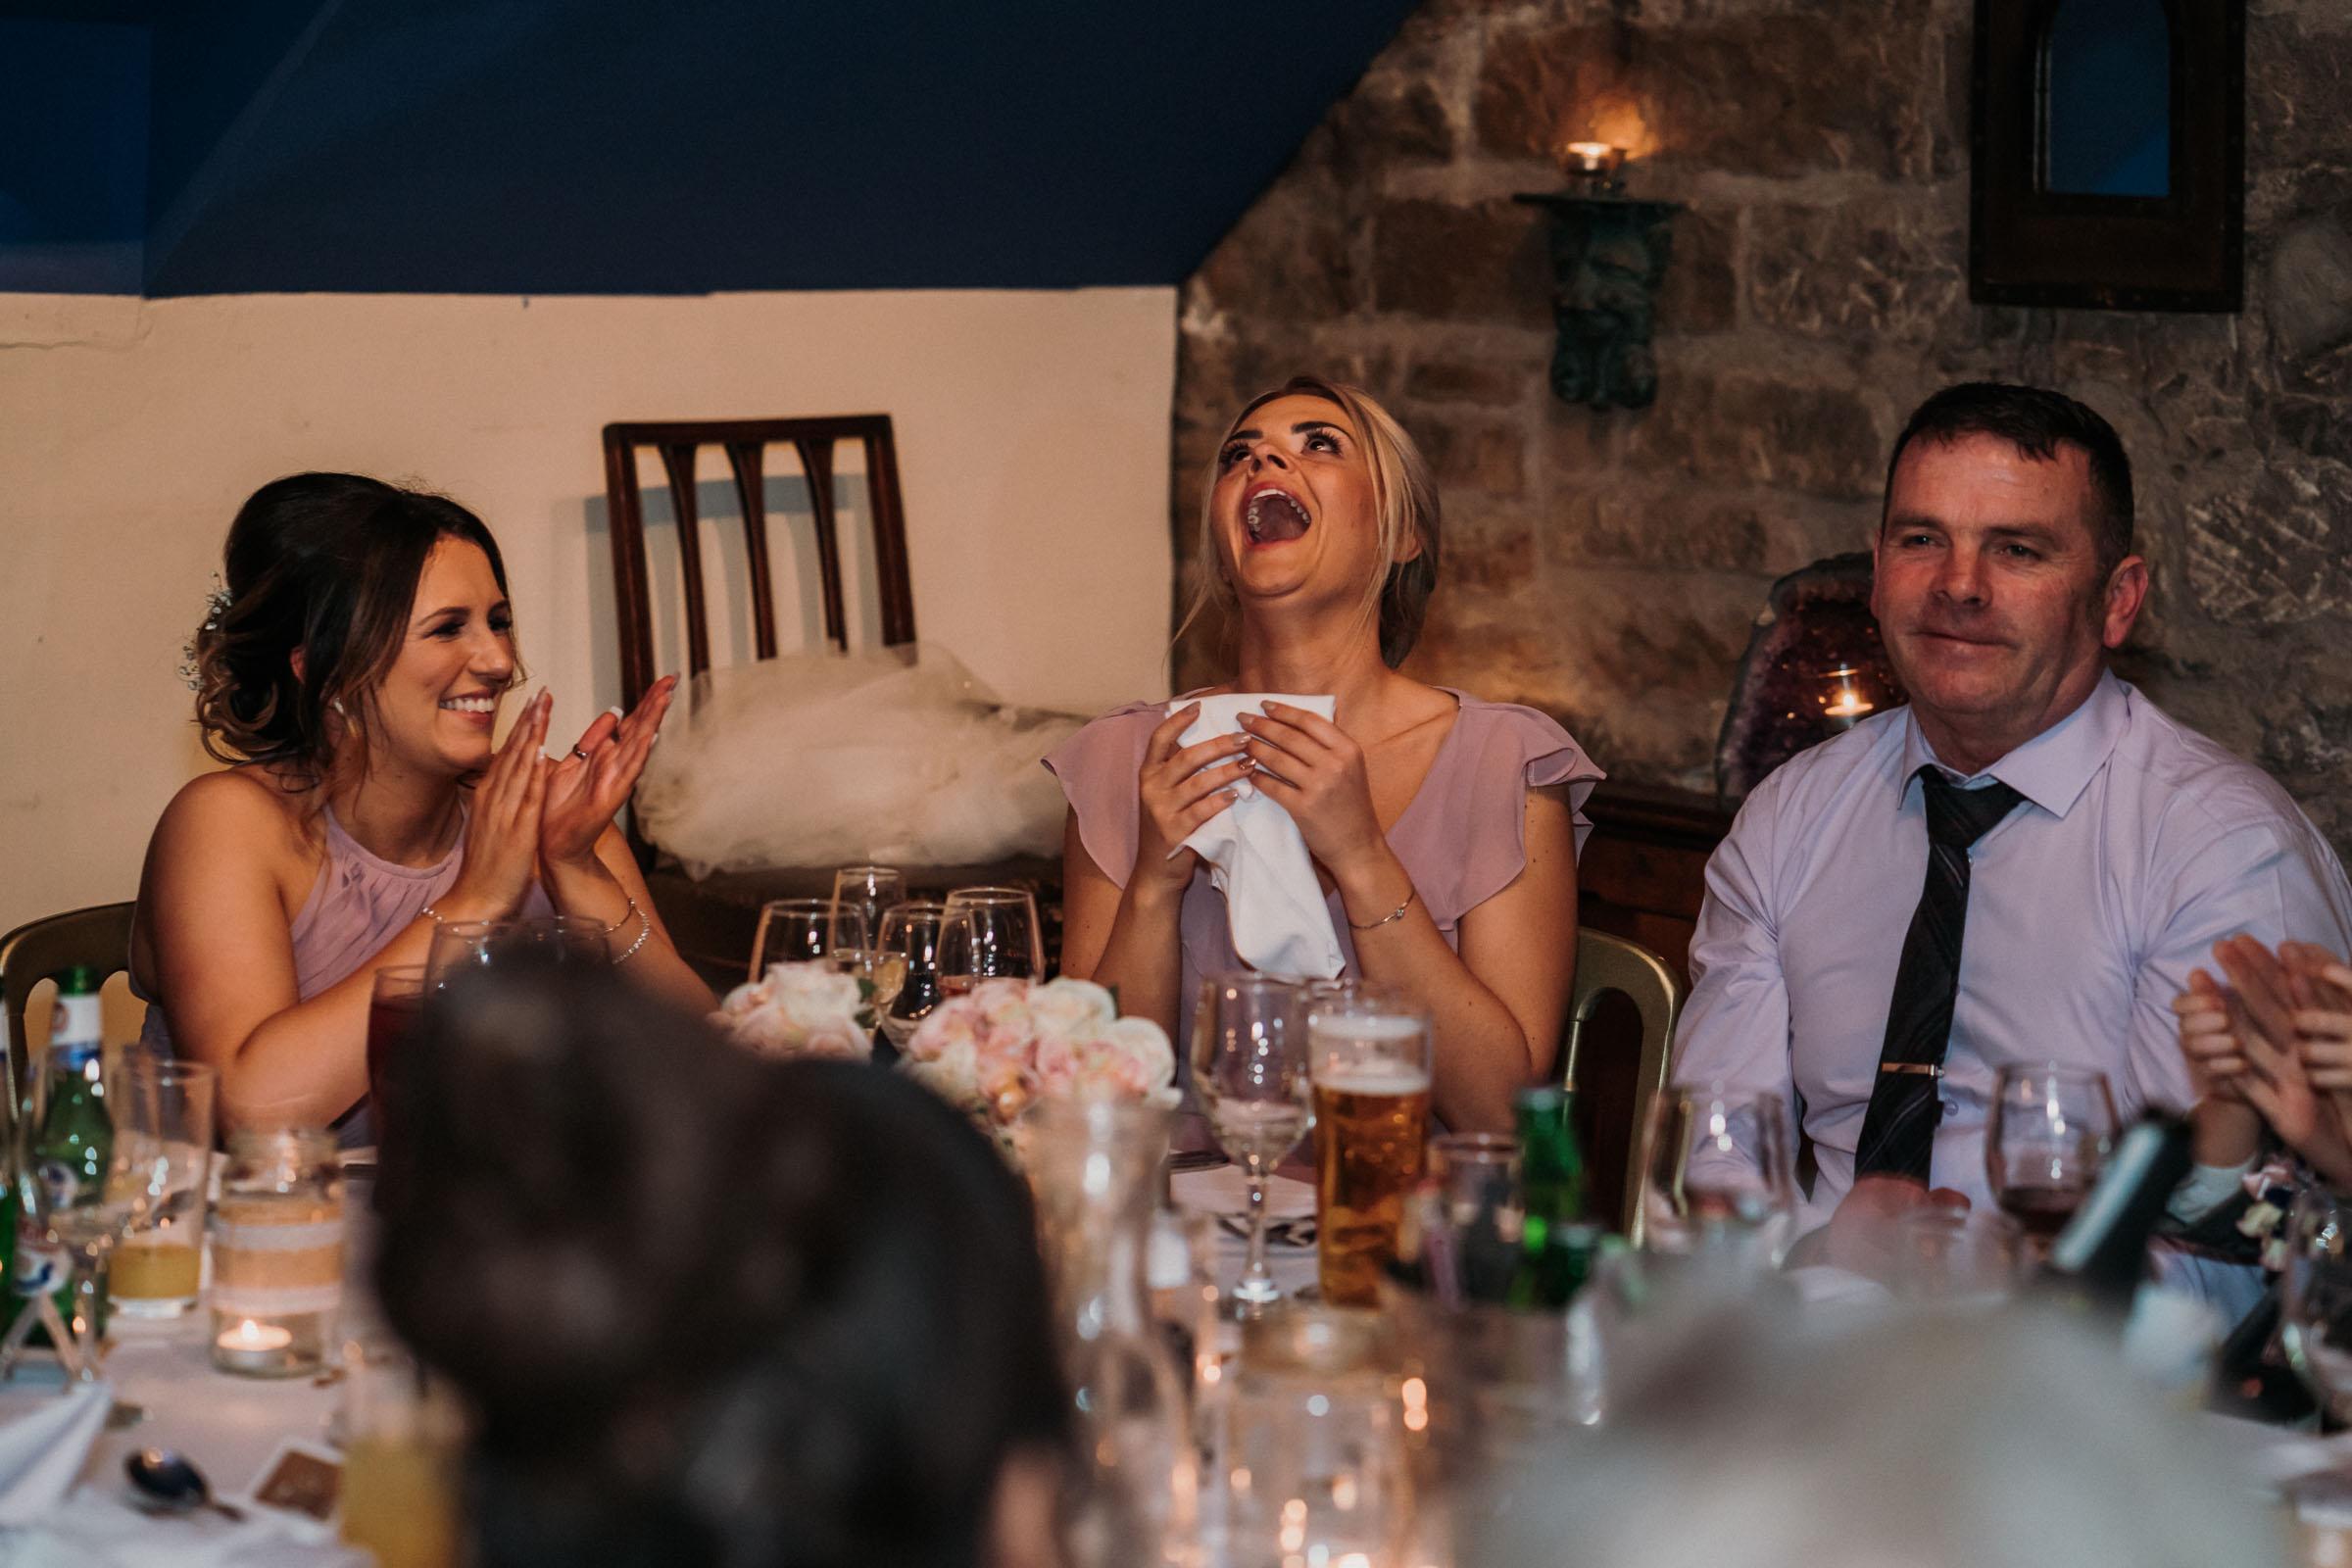 Oran-Mor-Wedding-Photographer-DearlyPhotography (36 of 55).jpg